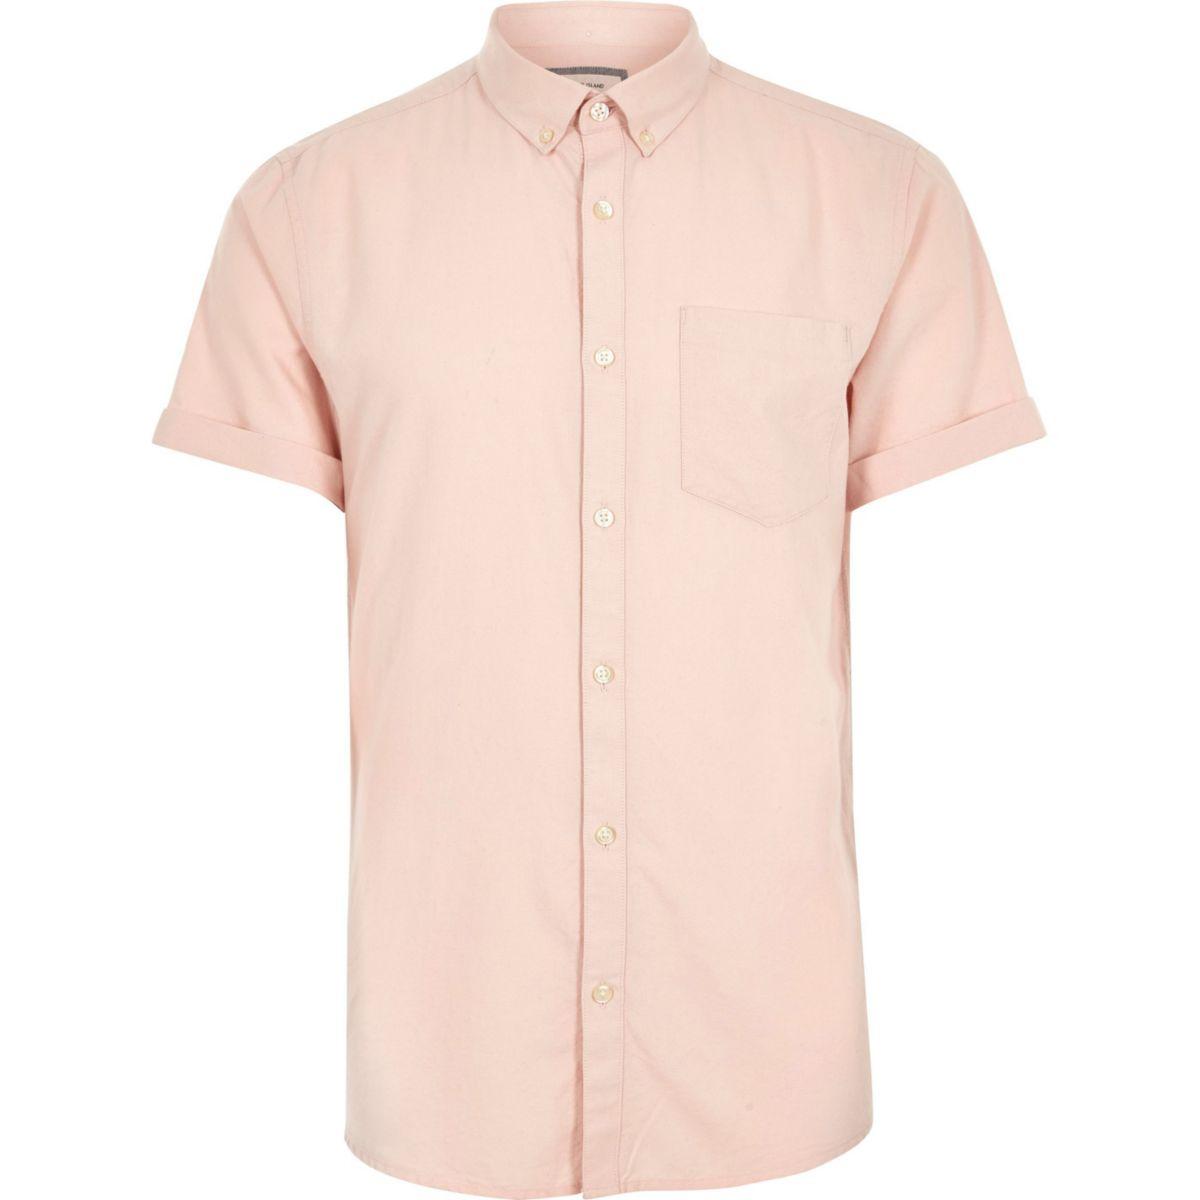 Big and Tall - Oxford roze overhemd met korte mouwen